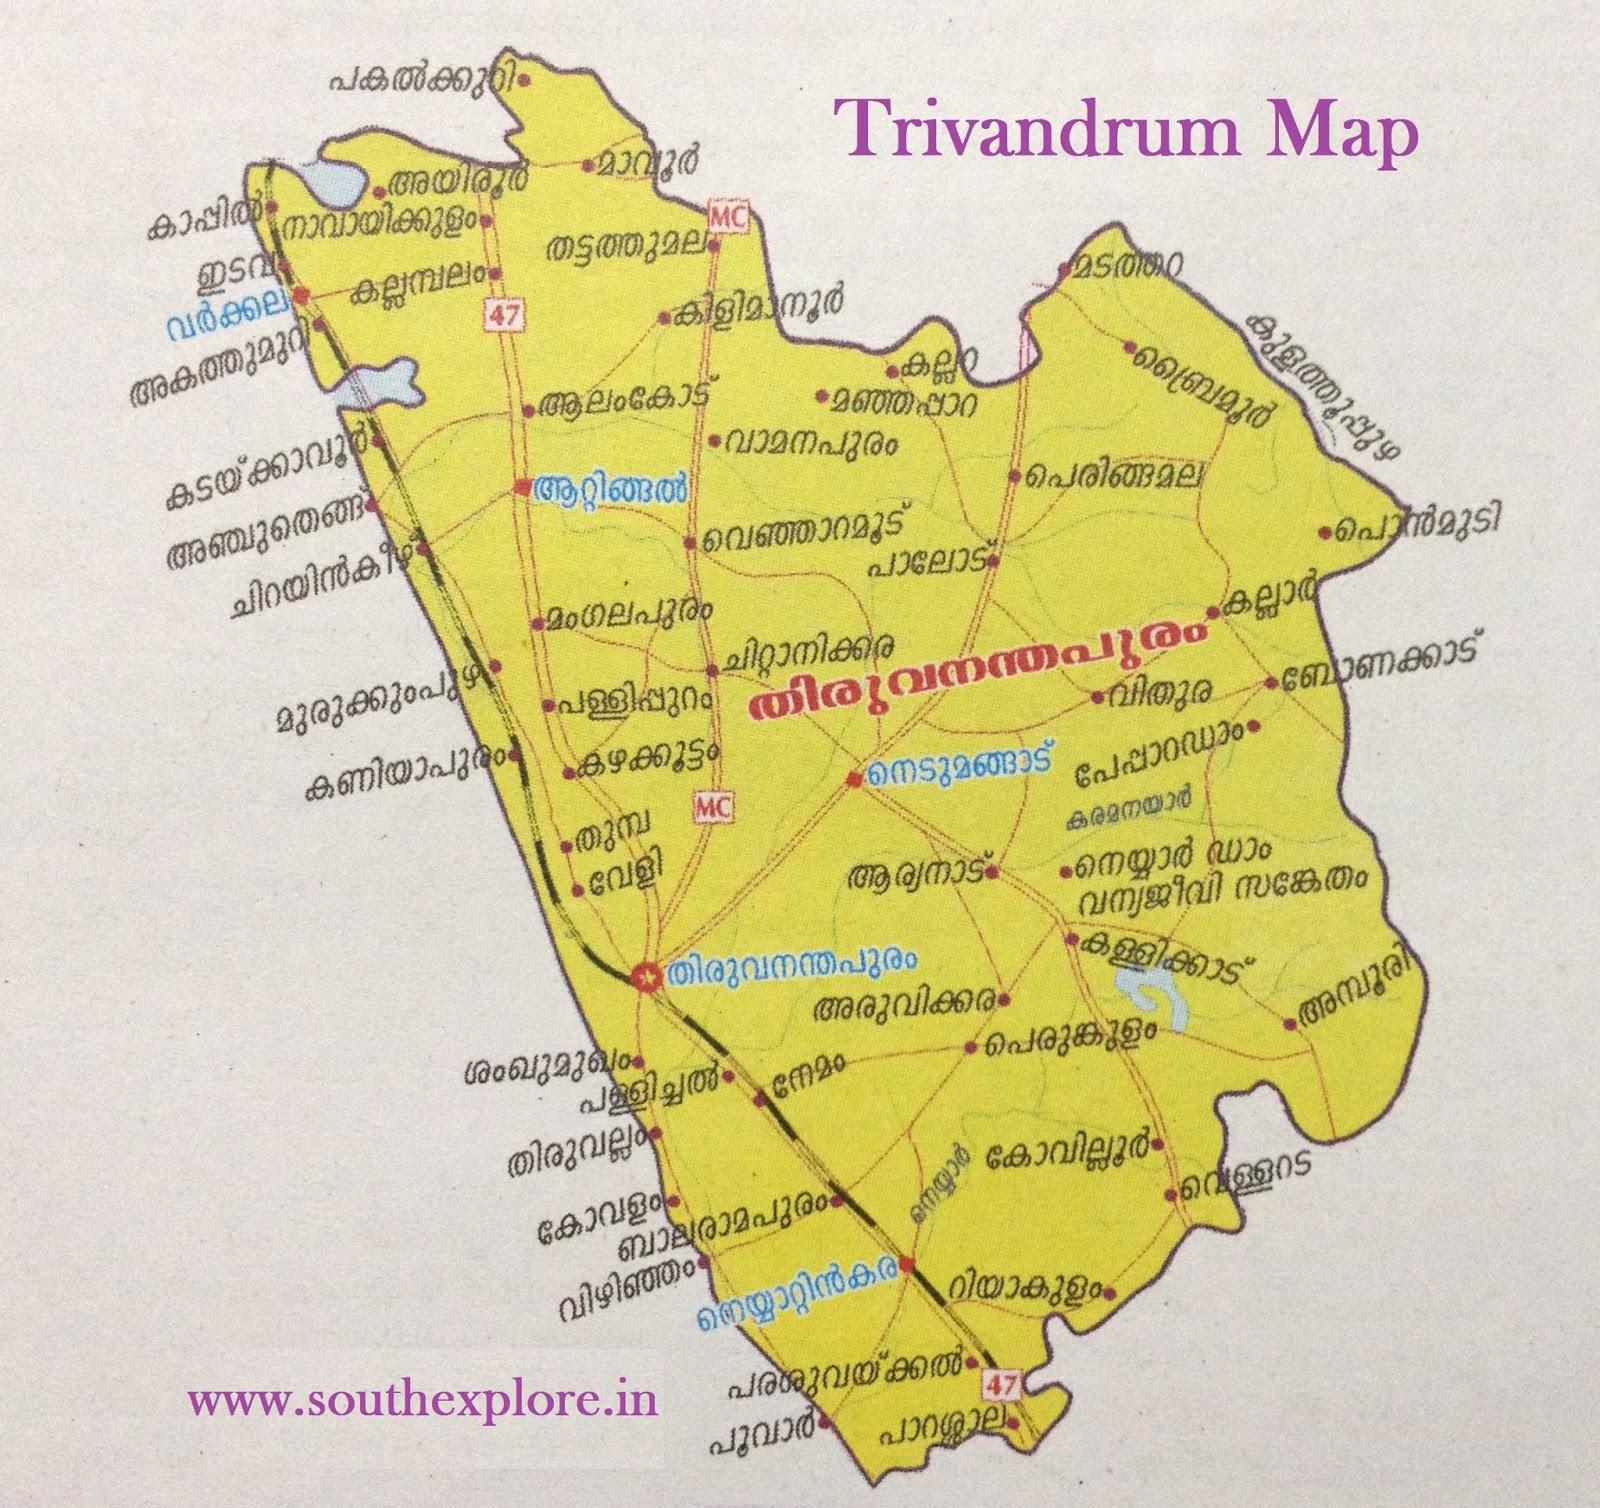 THIRUVANANDHAPURAM TOURIST MAP TOURIST PLACES IN TRIVANDRUM